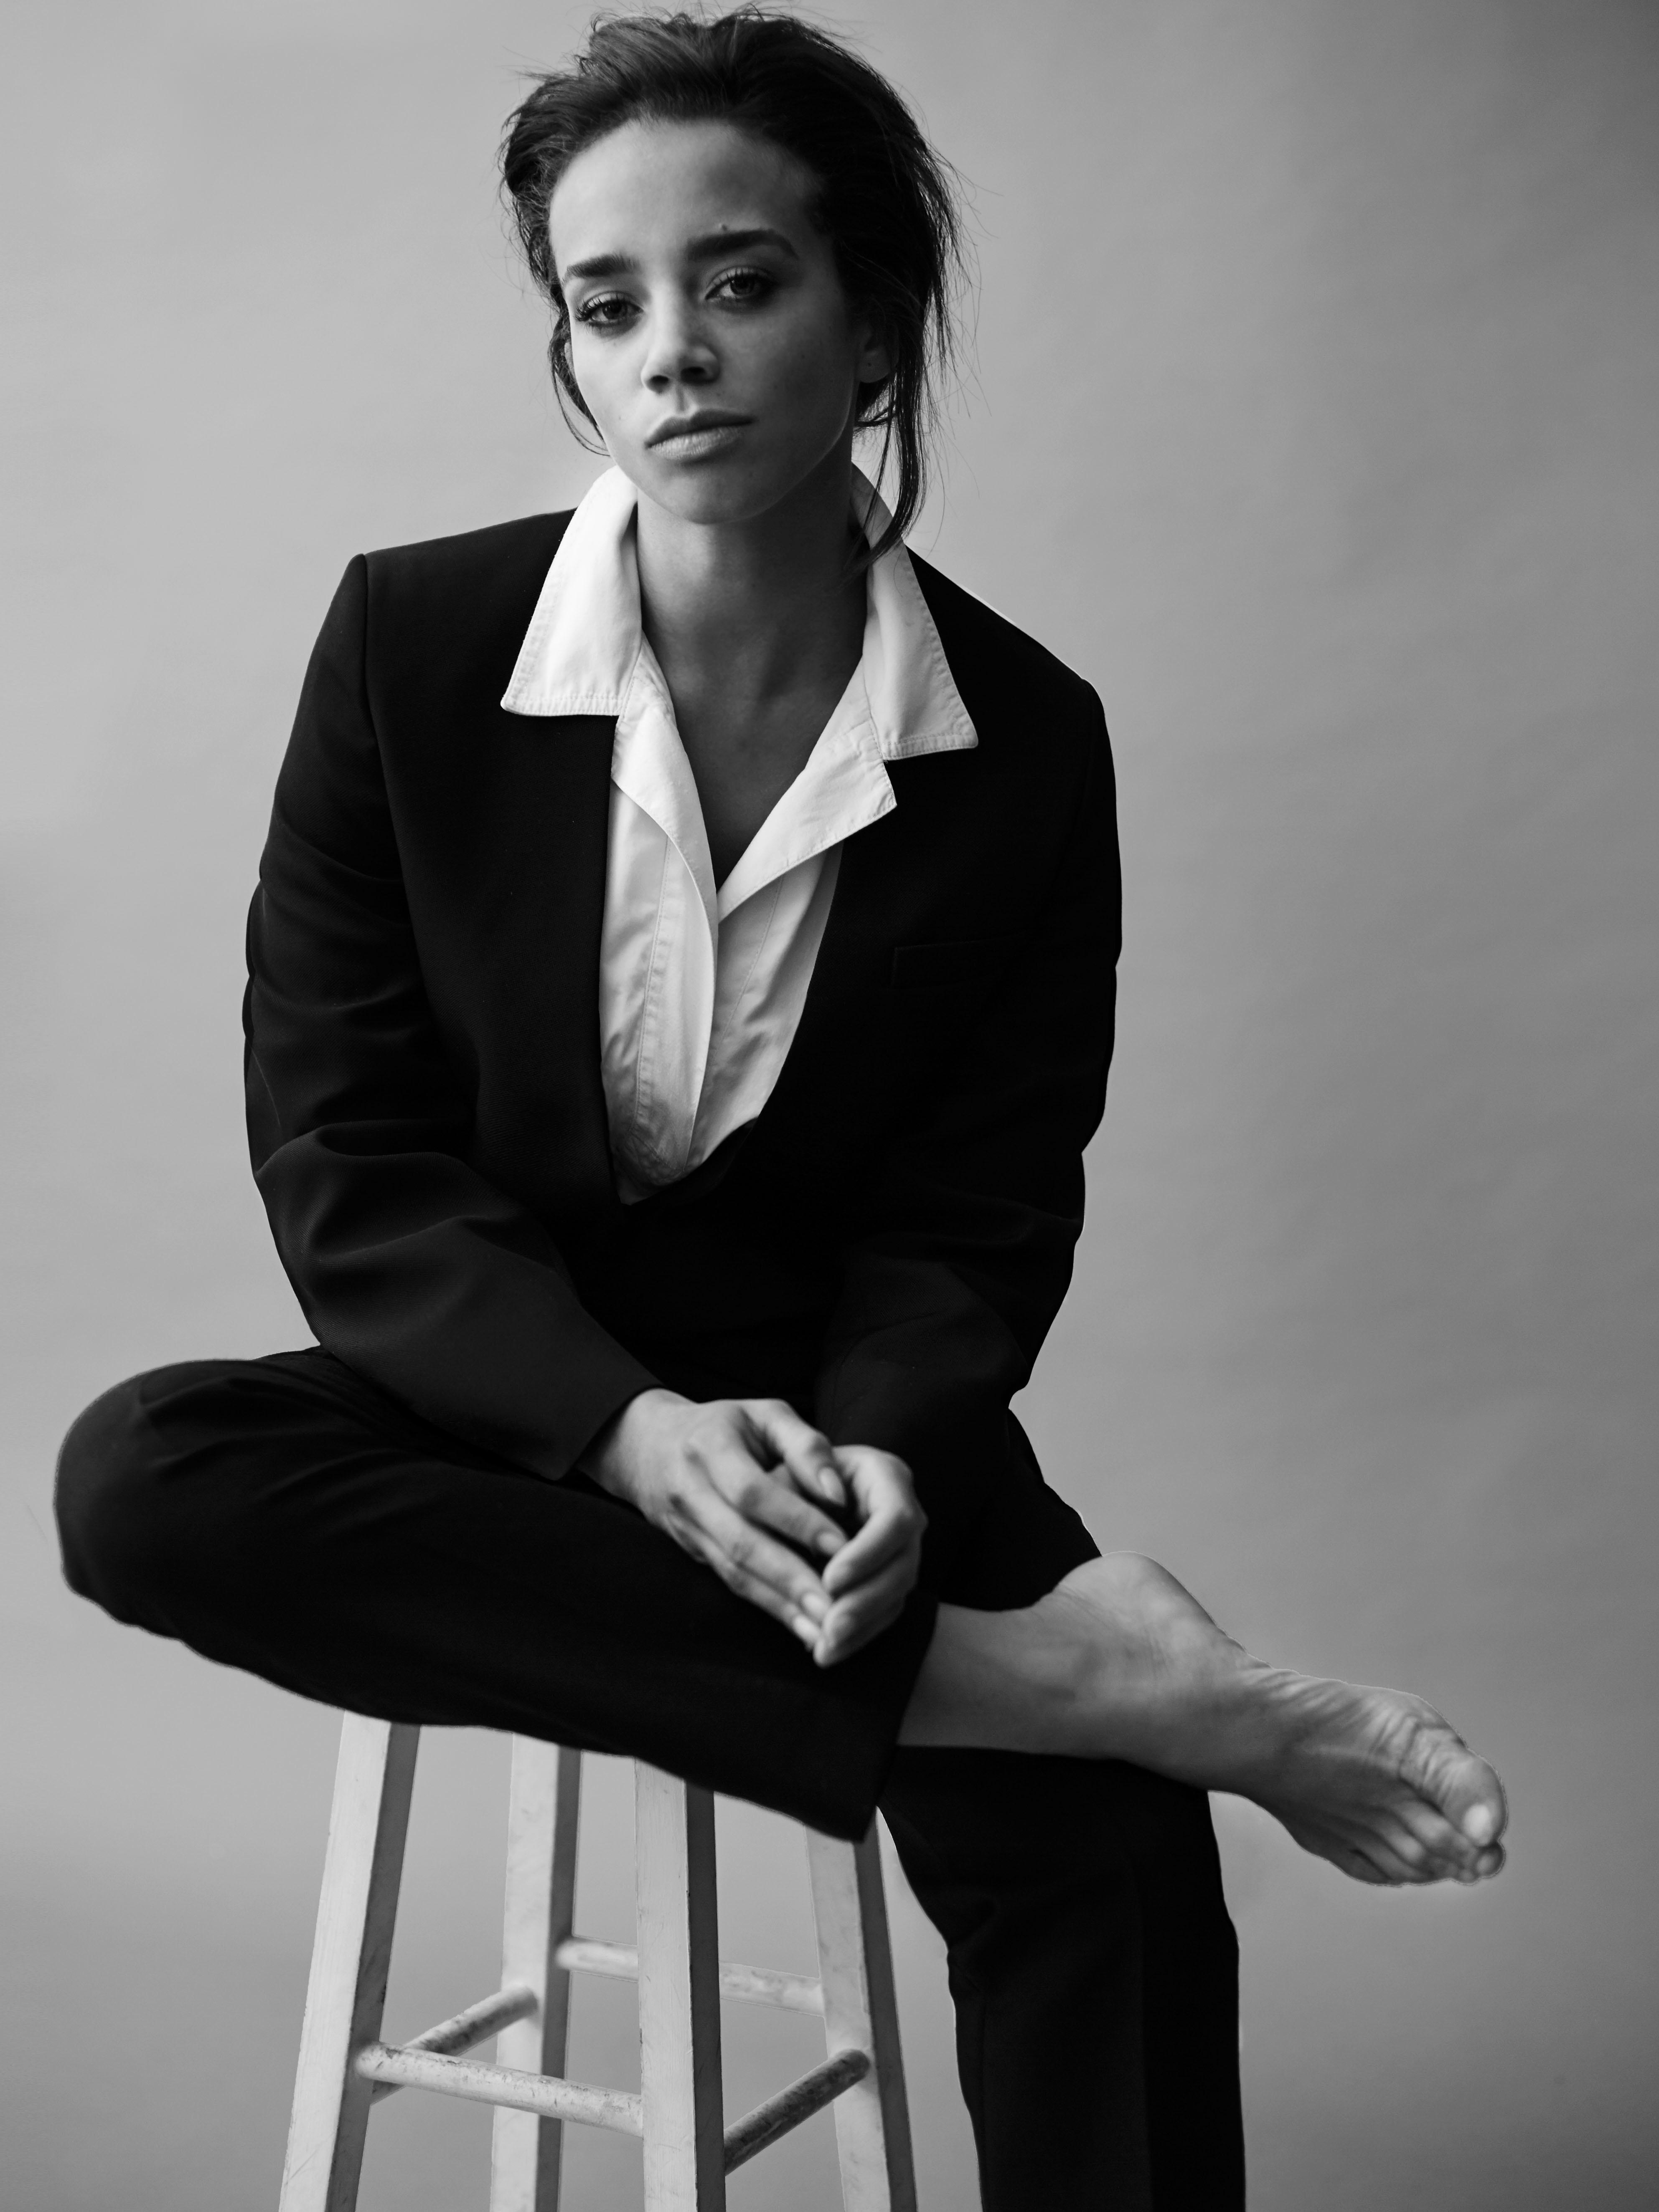 Feet Hannah John Kamen nude photos 2019